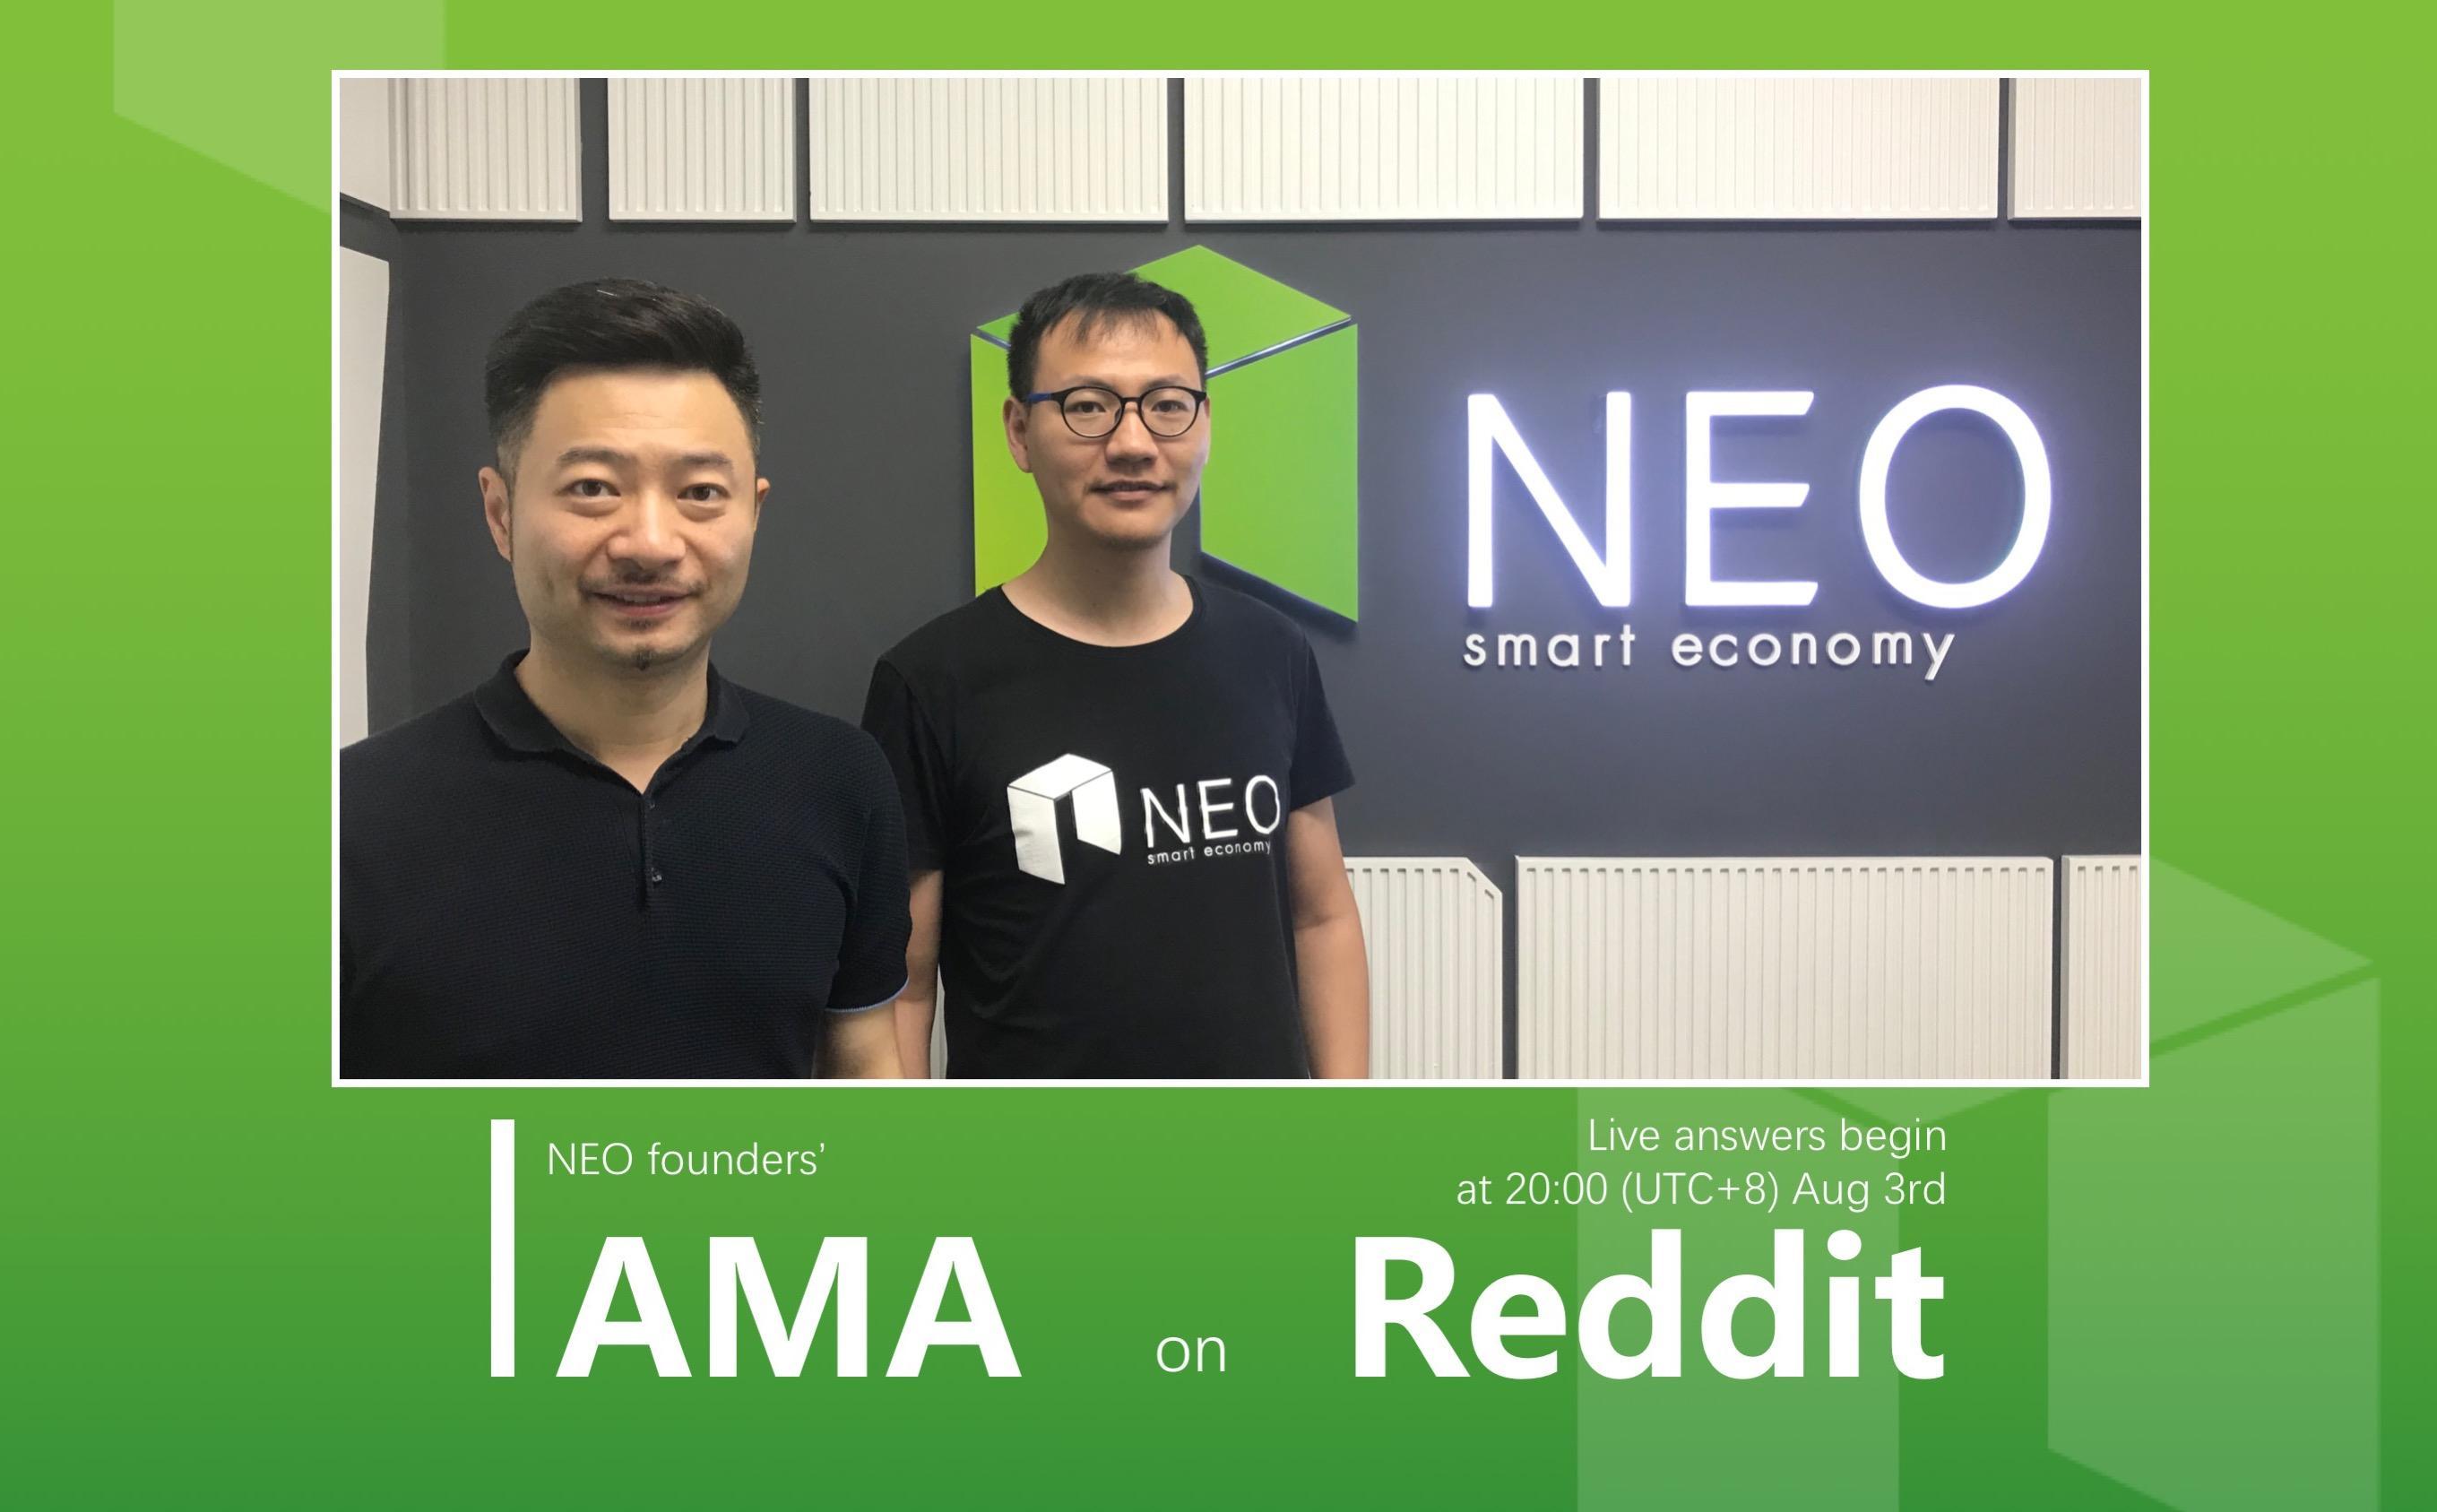 NEO founders (Reddit)